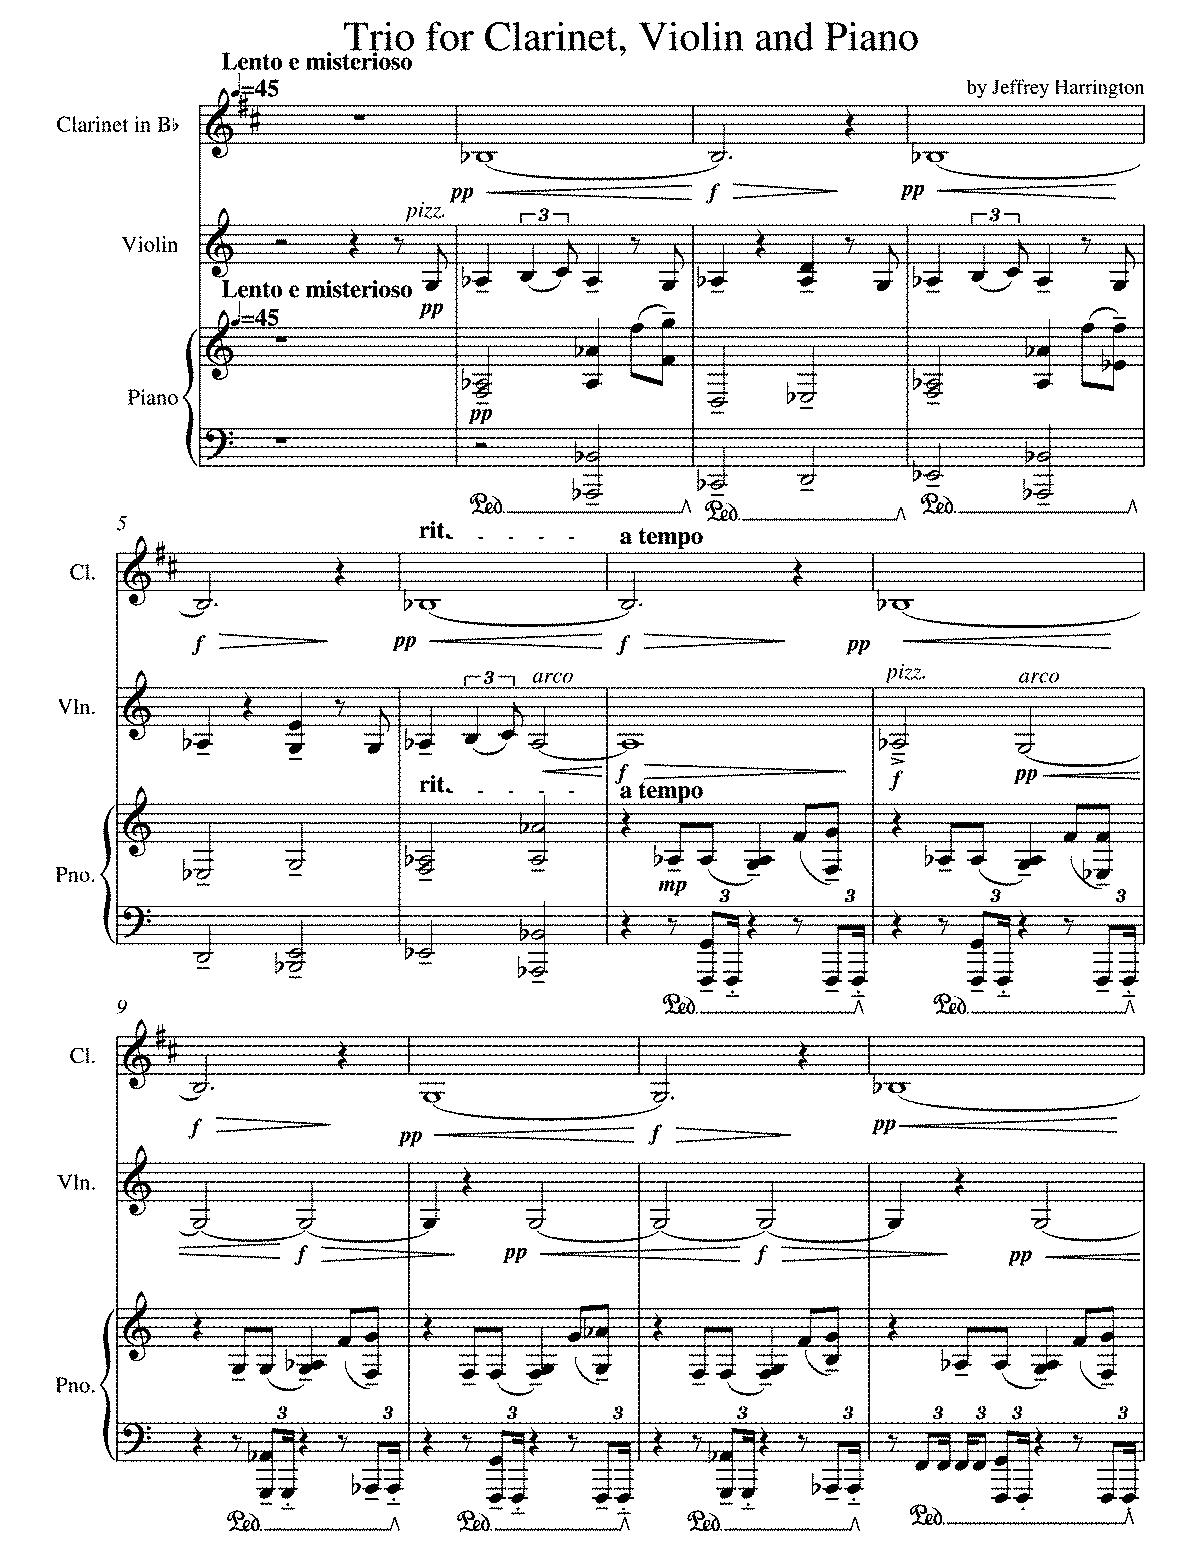 Free Sheet Music Downloads Clarinet Trios